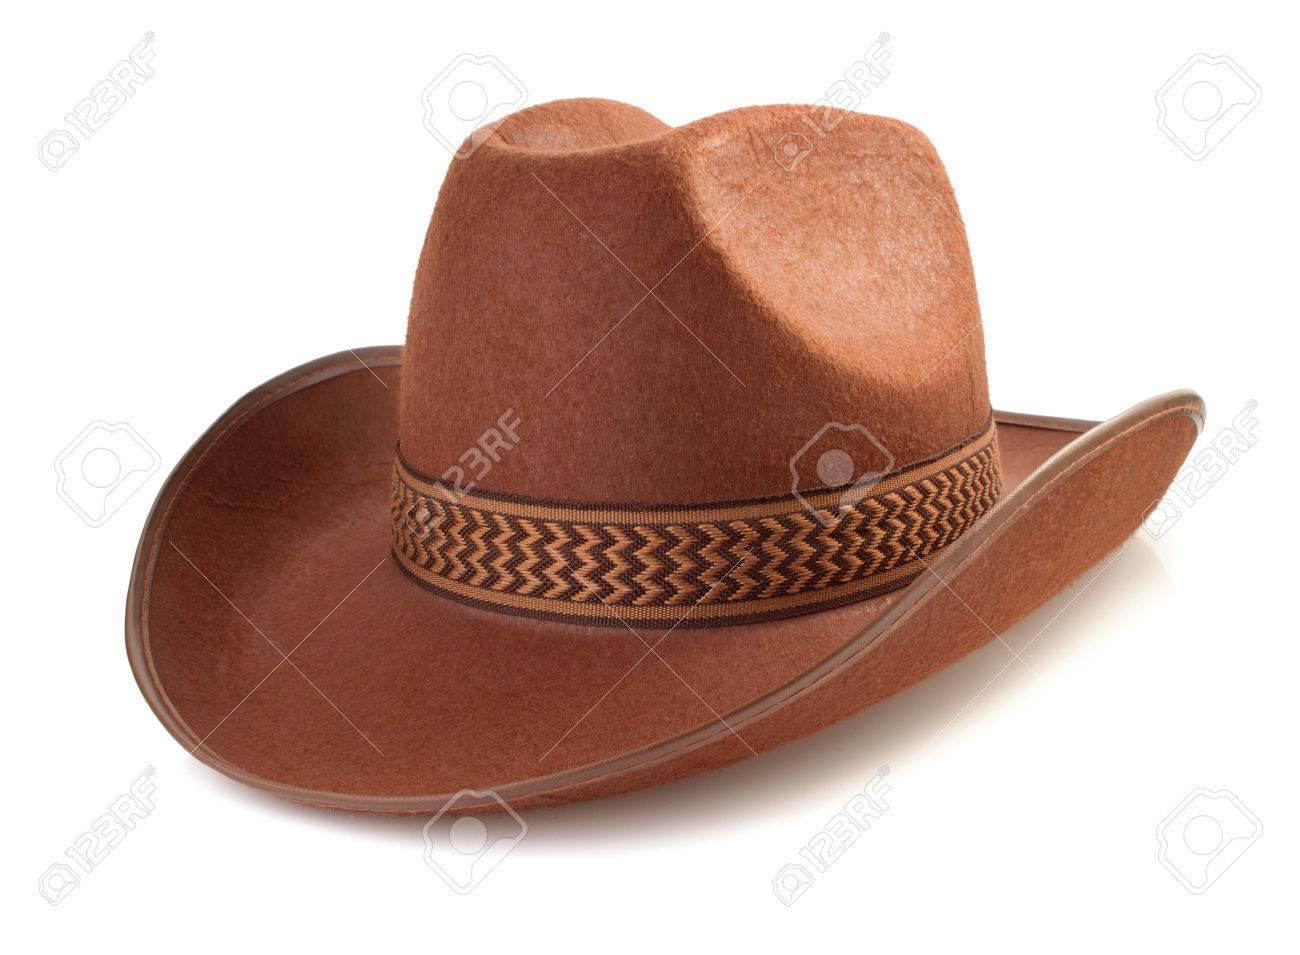 cowboy hat isolated on white background - 35951003